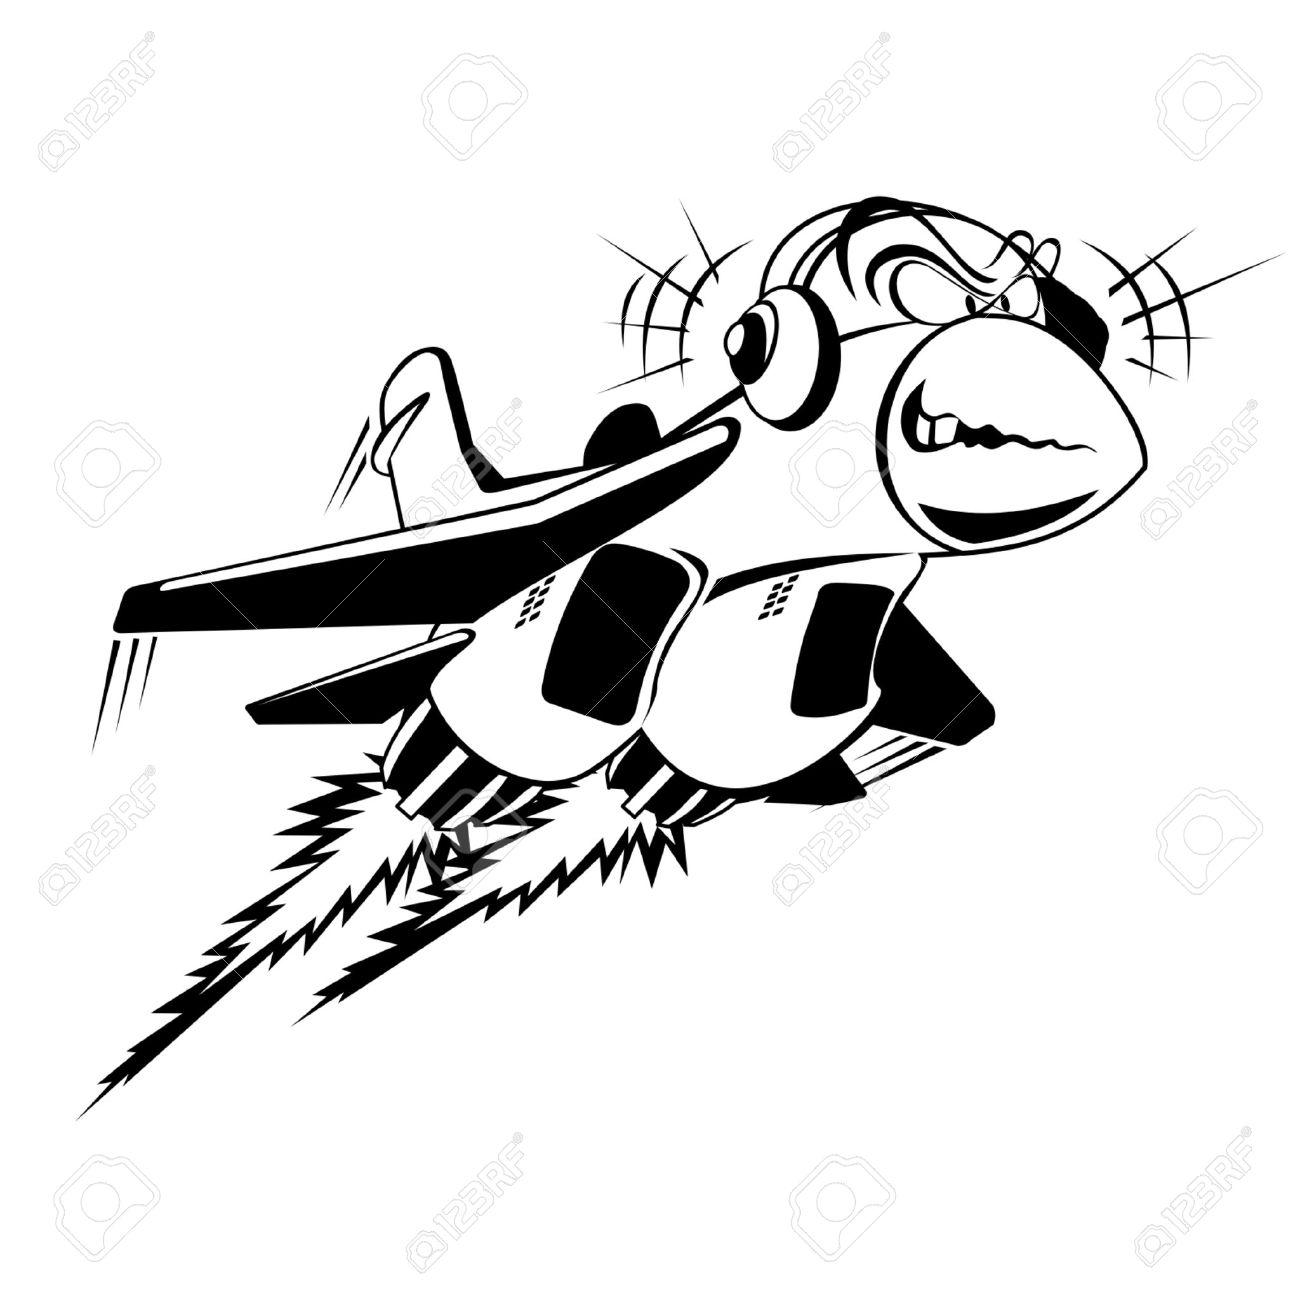 Cartoon Fighter Jet Clipart